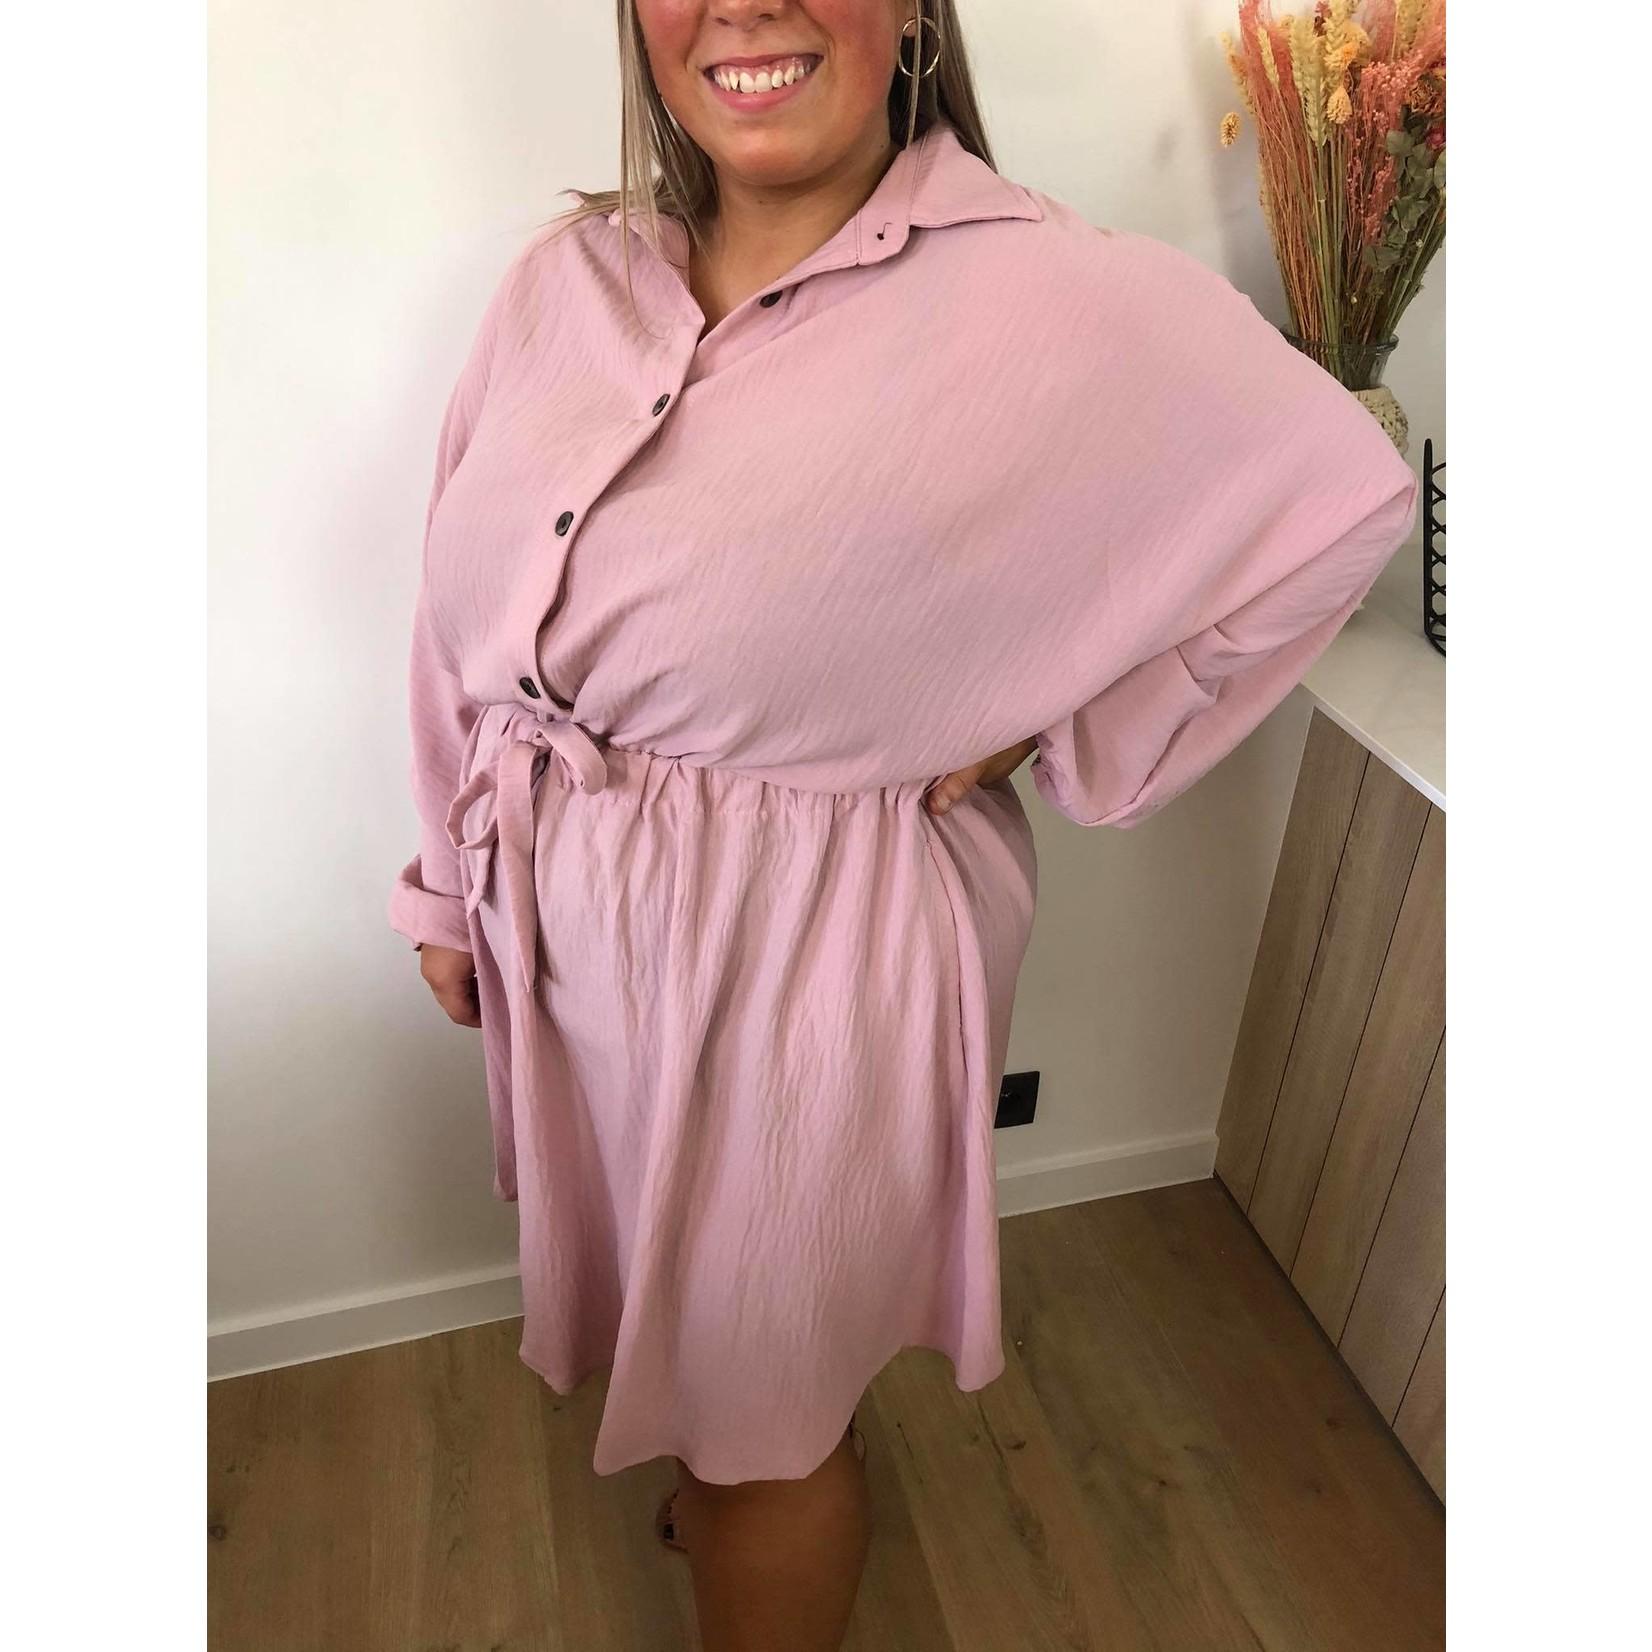 Sweet buttoned dress pink